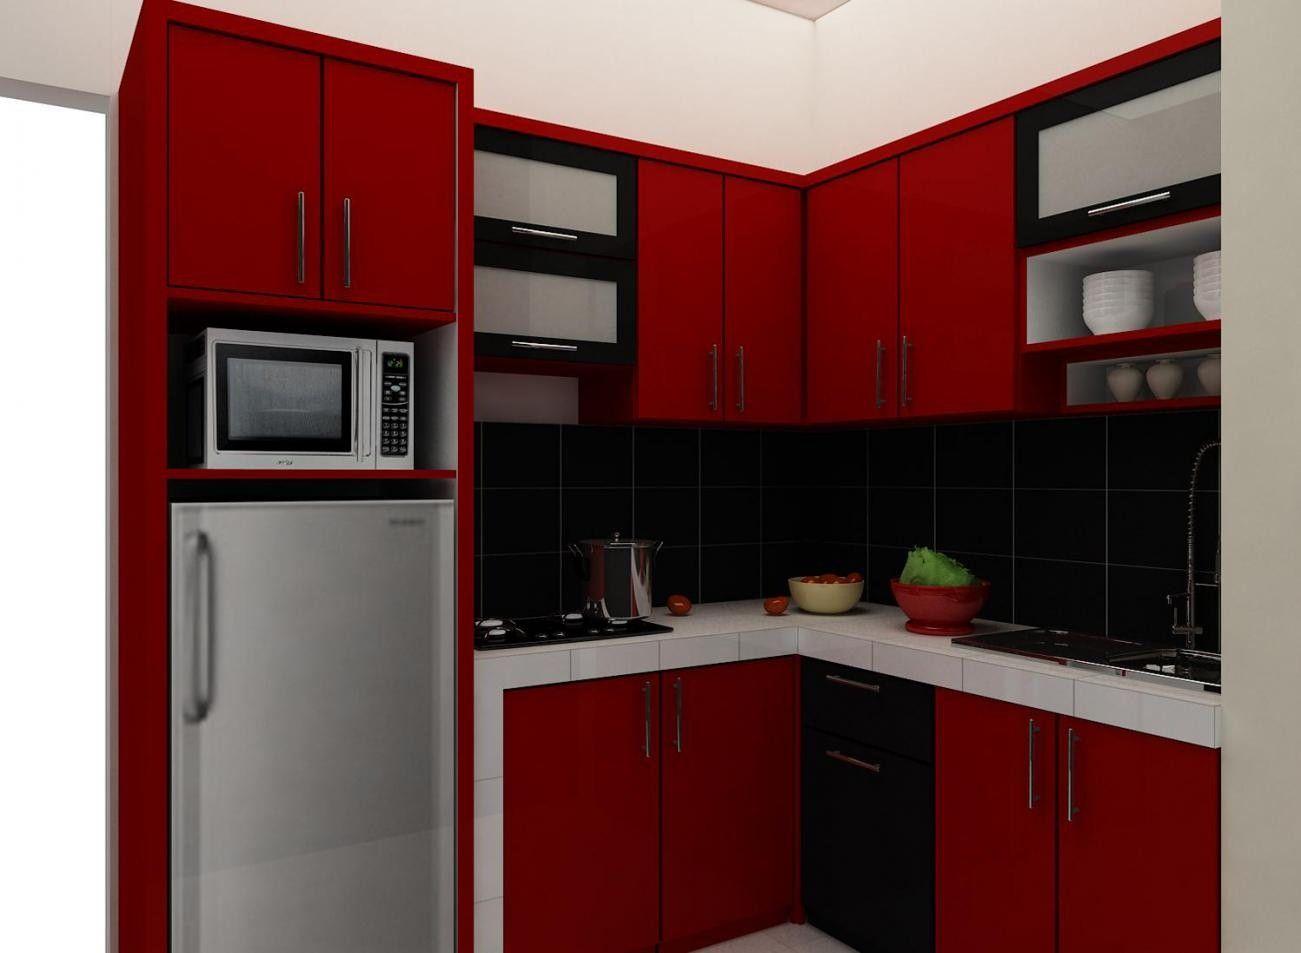 Menata Interior Desain Kabinet Dapur Rumah Mungil Minimalis Zonabuzz